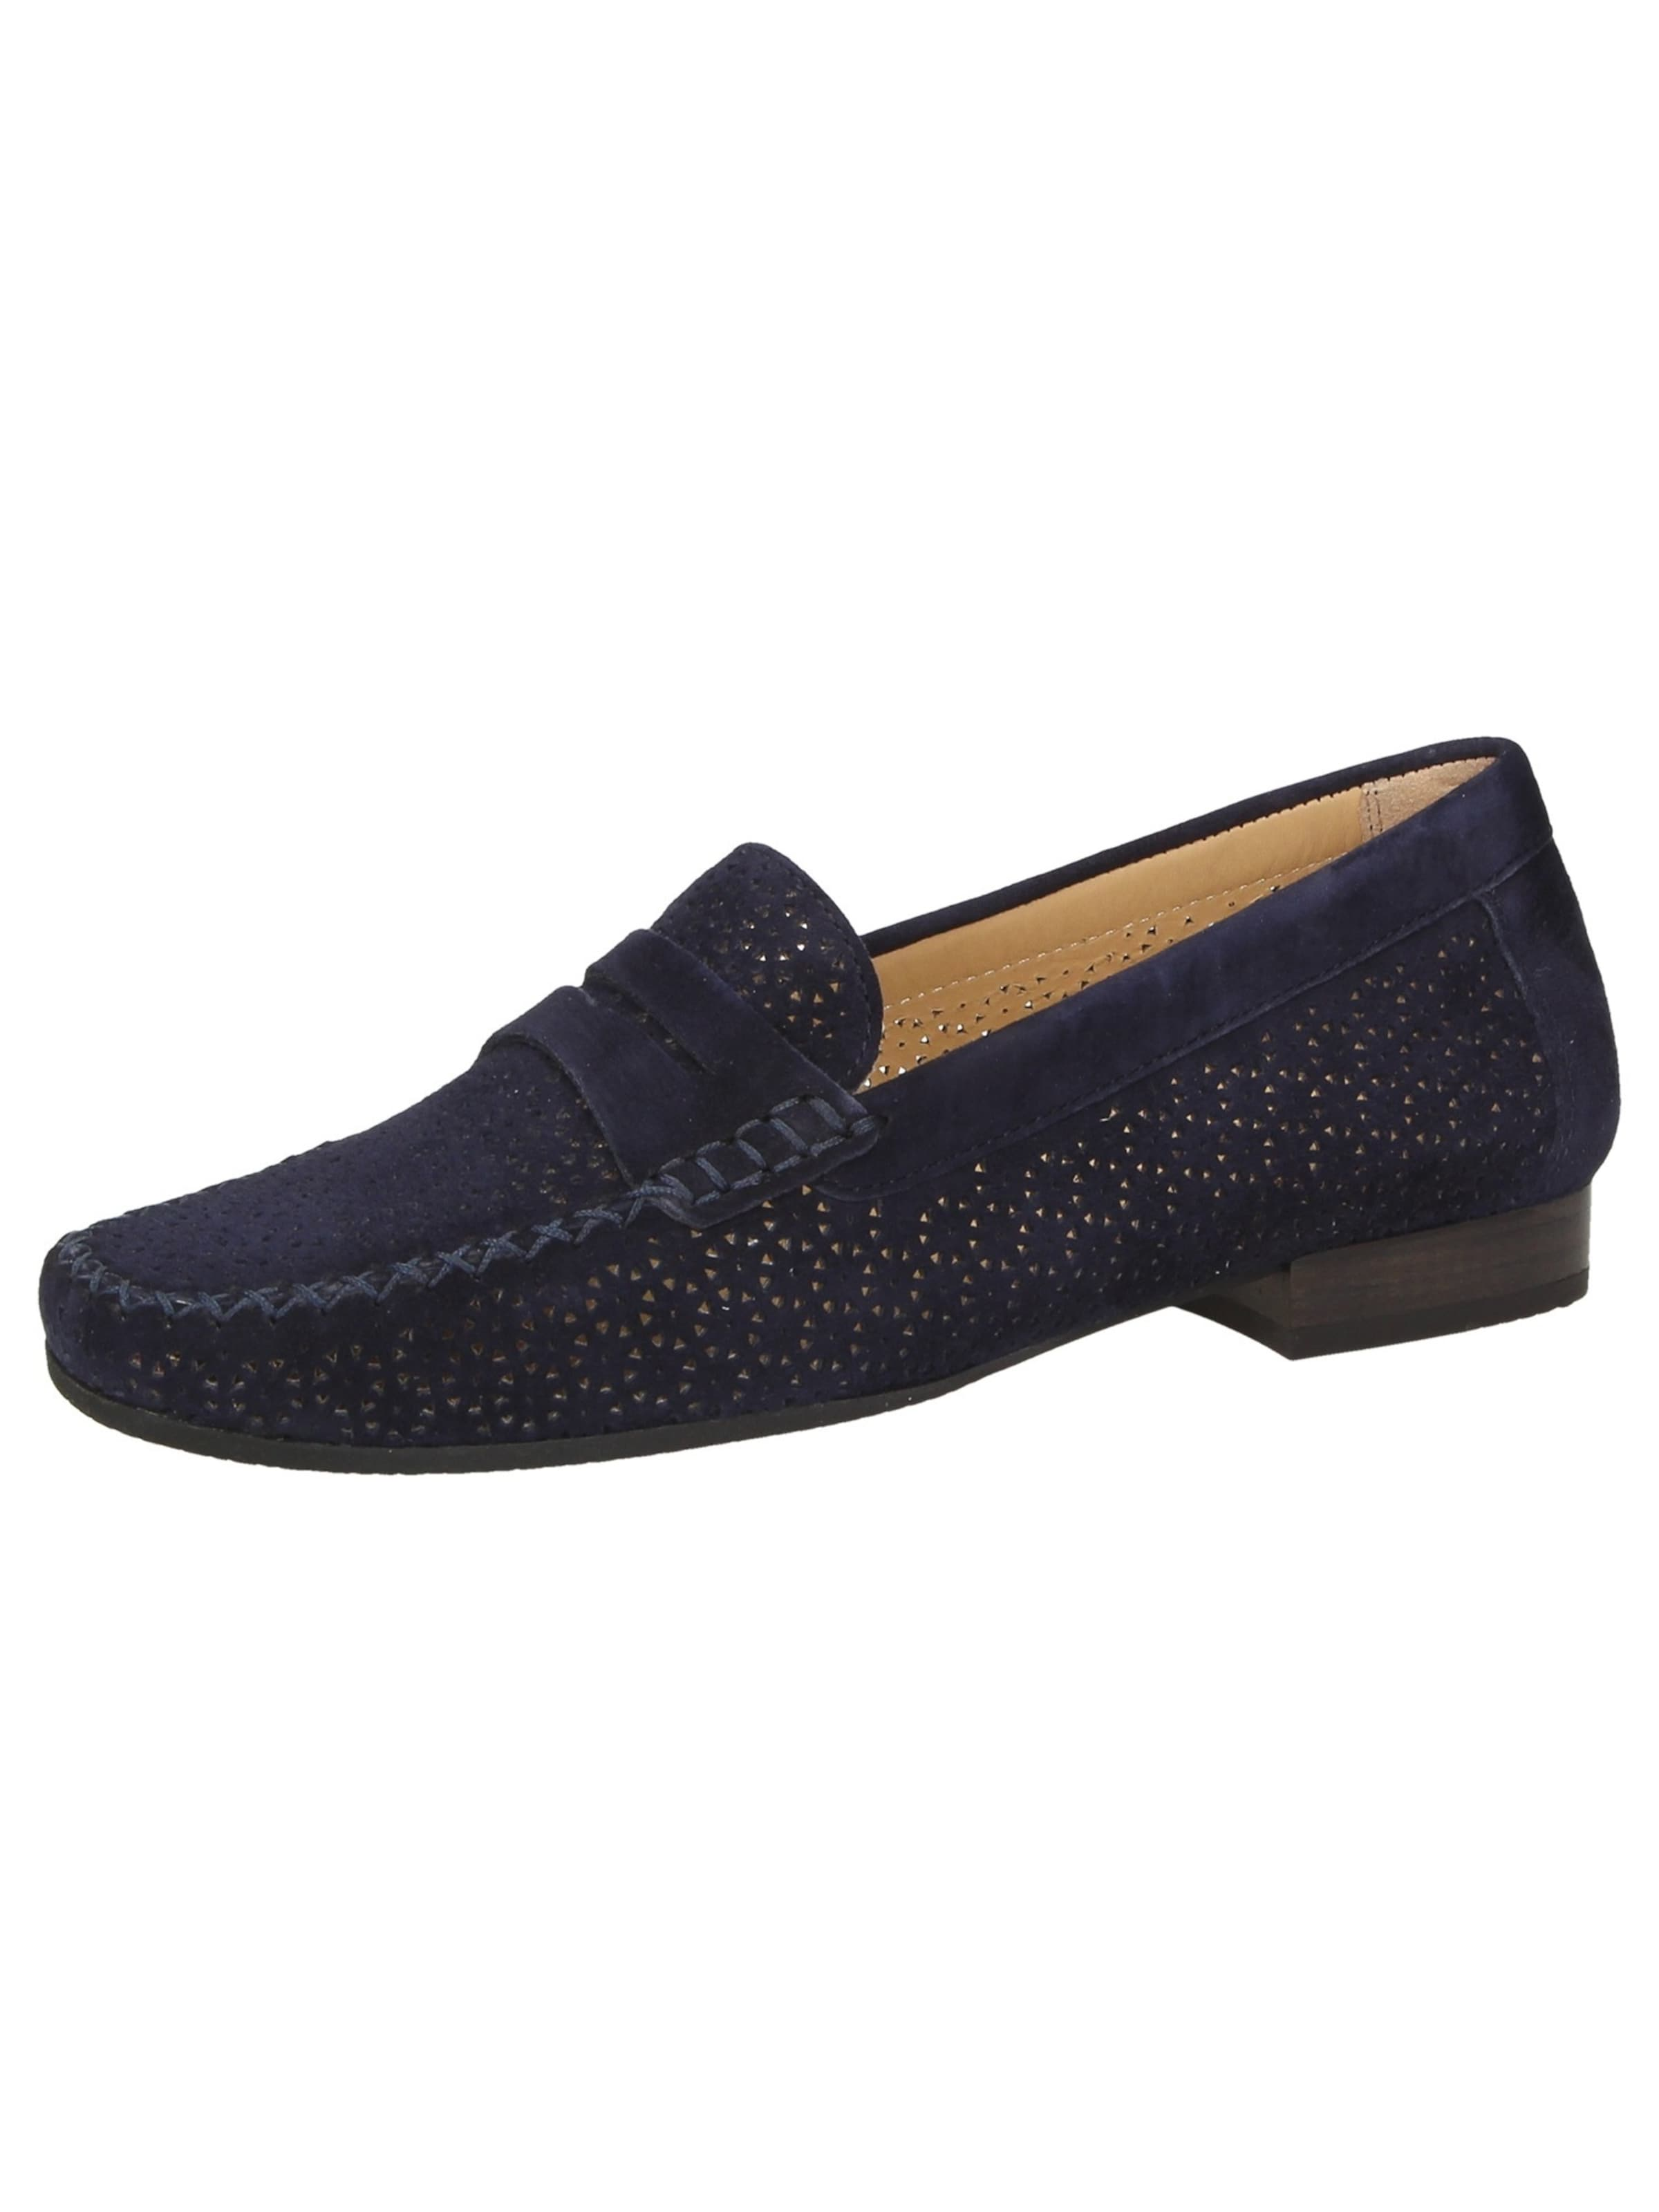 Haltbare Mode billige Schuhe SIOUX | Slipper 'Cortizia-701' Schuhe Gut getragene Schuhe